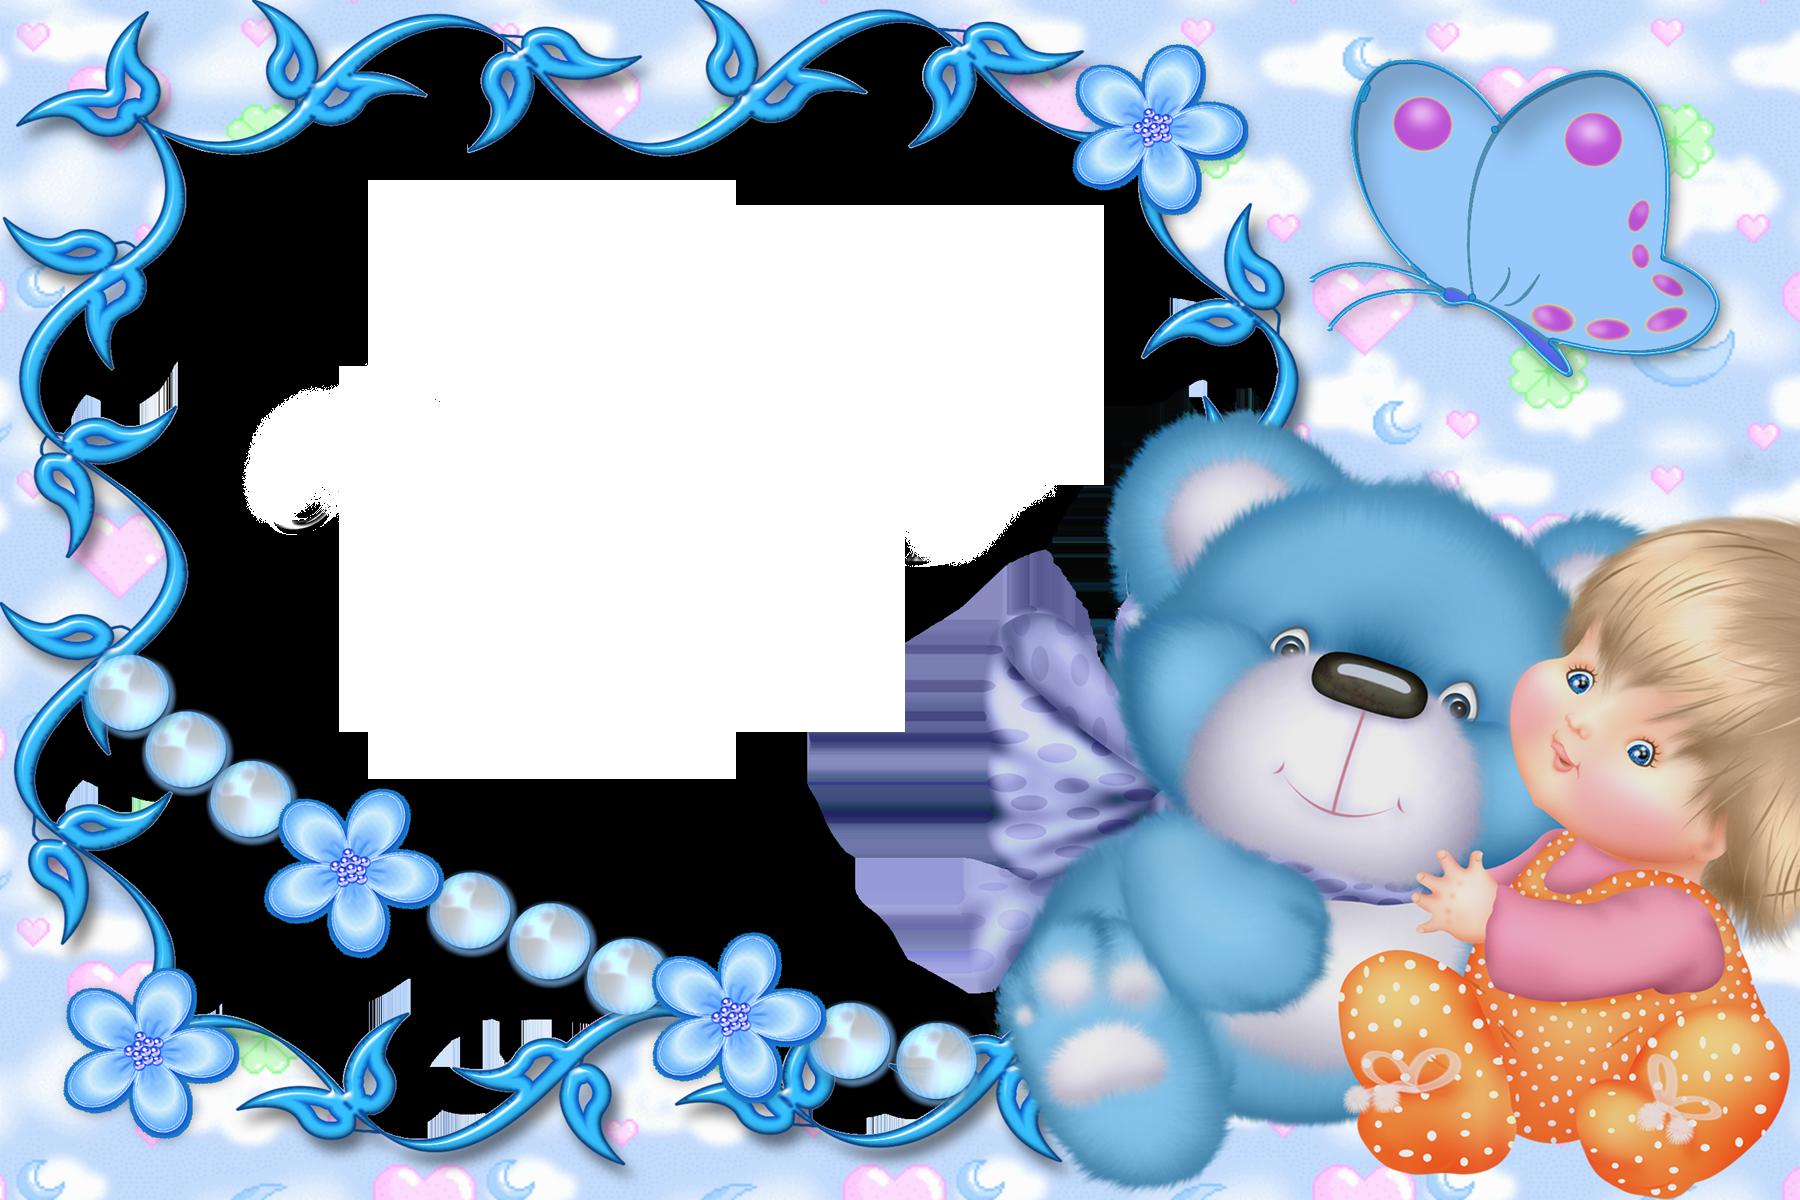 Teddy clipart frame View Kid Gallery Cute Blue